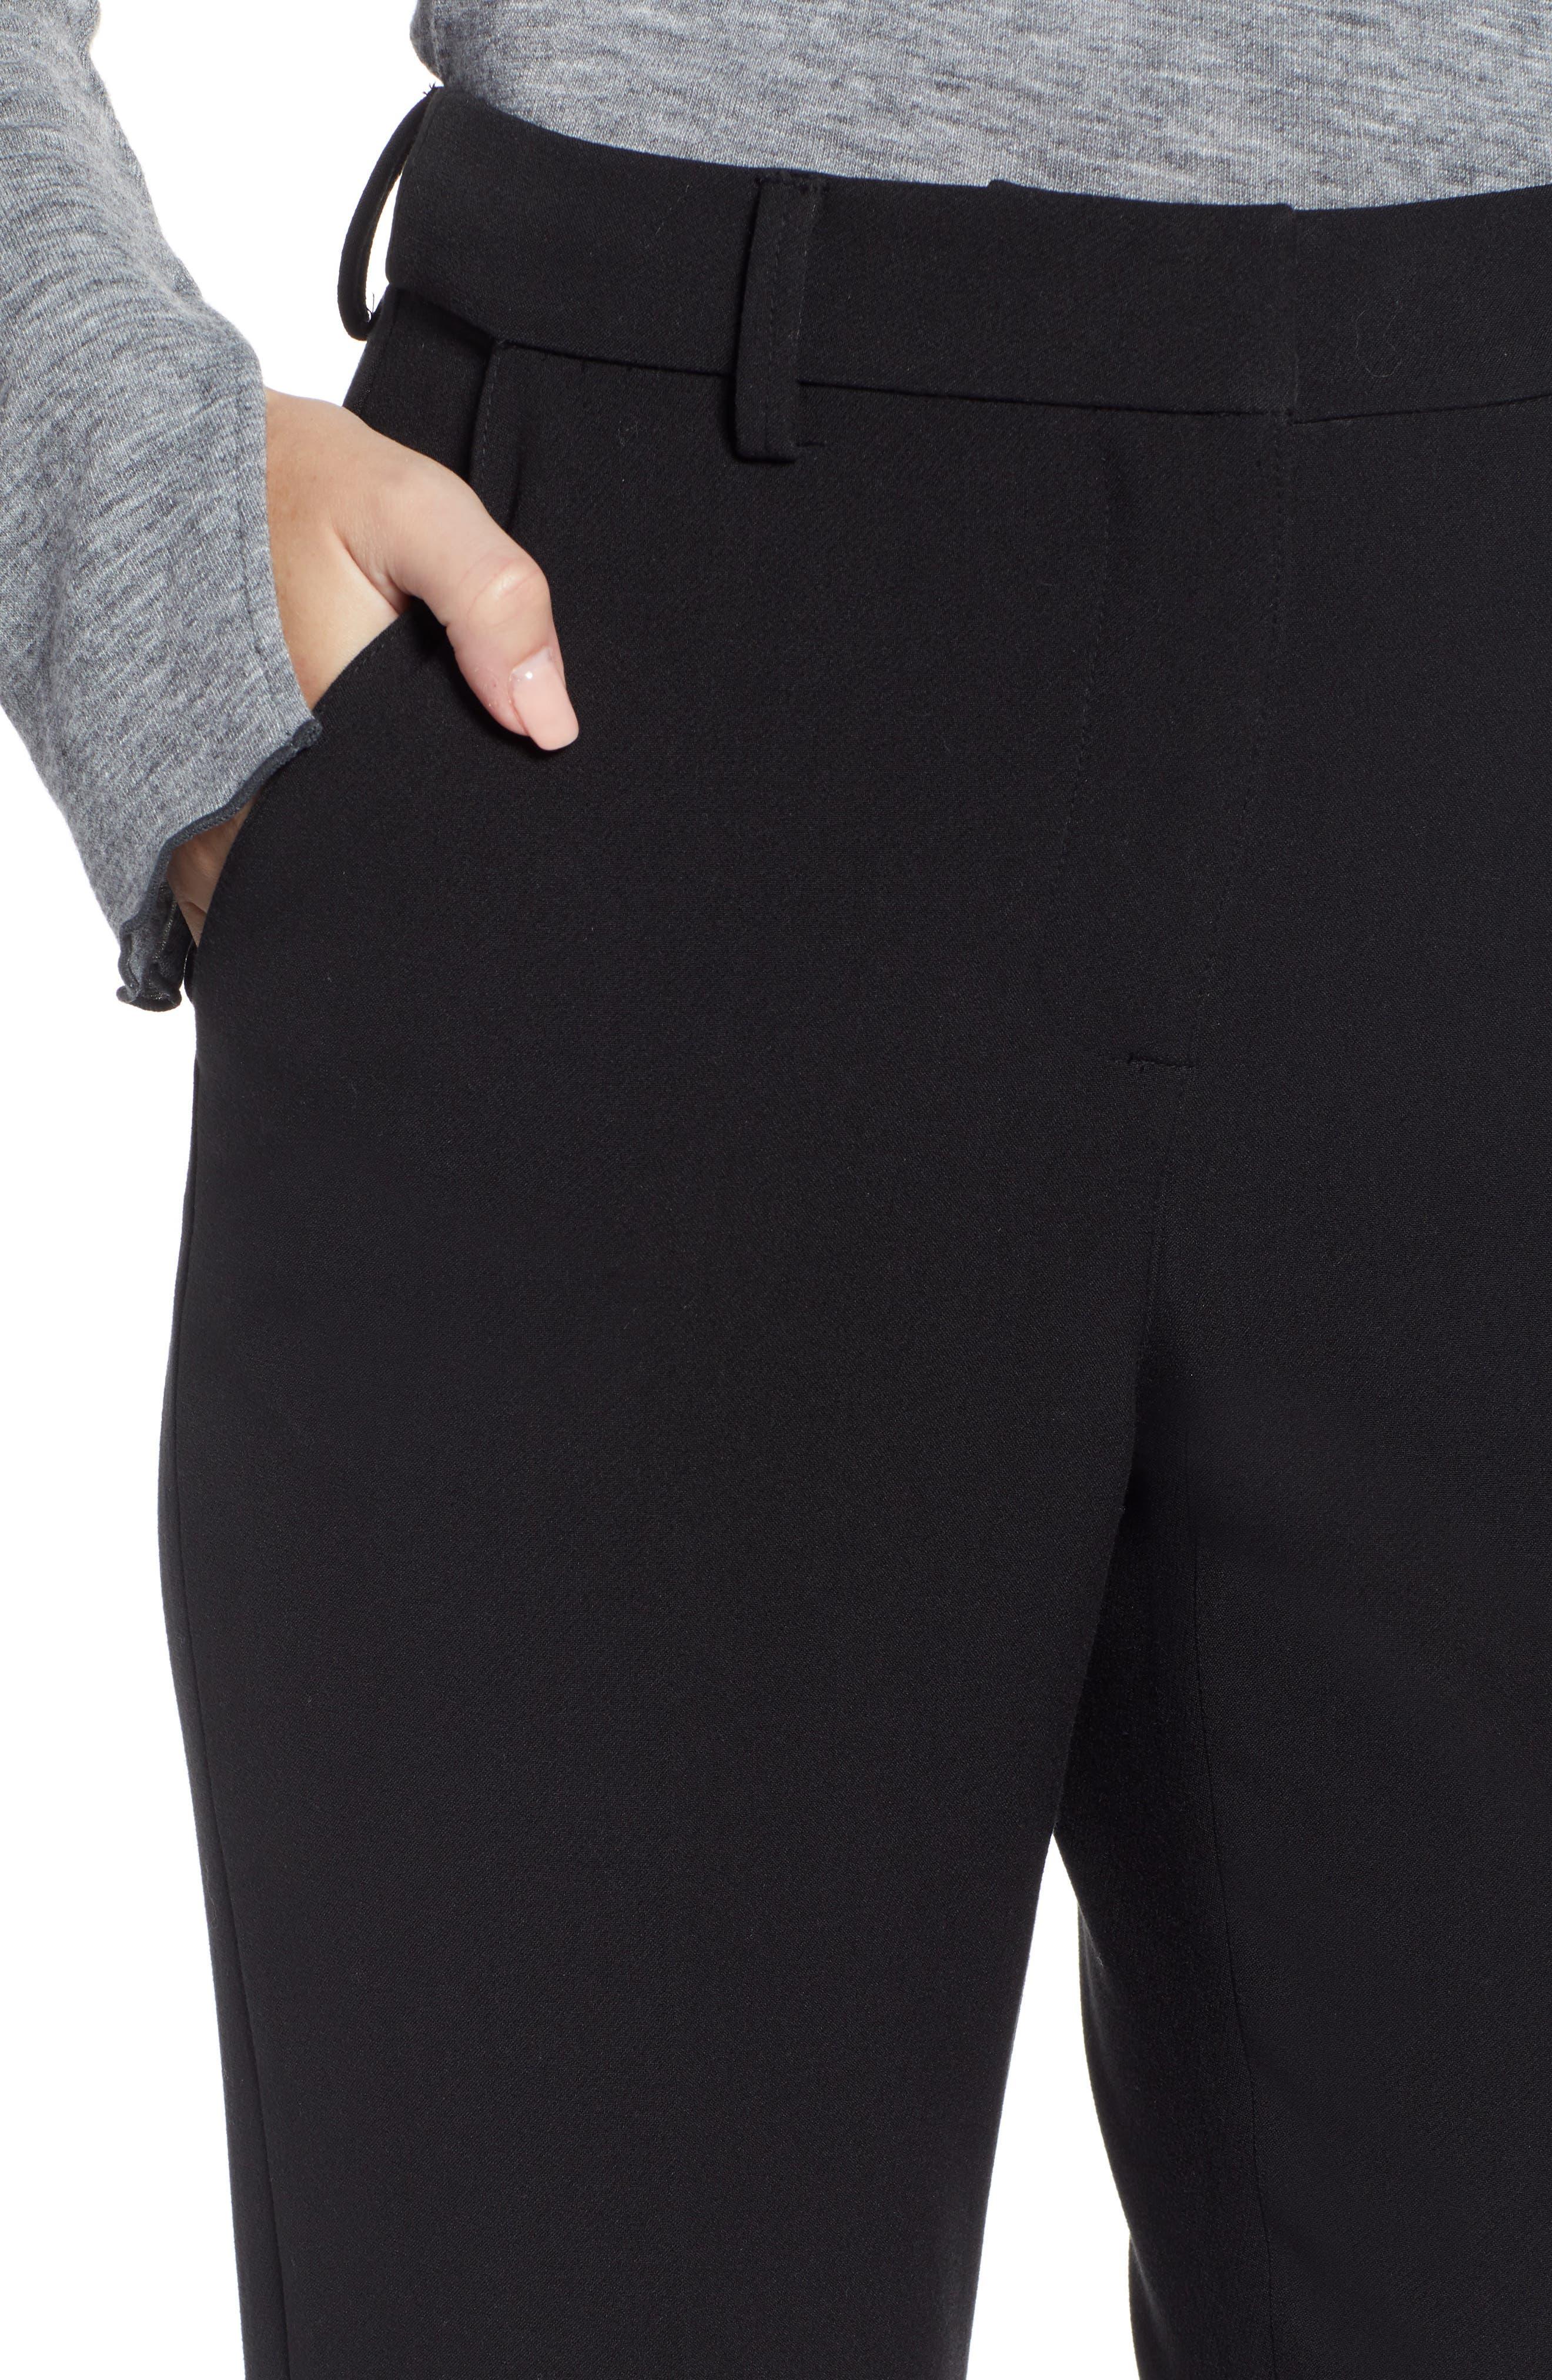 Flat Front Trousers,                             Alternate thumbnail 4, color,                             BLACK